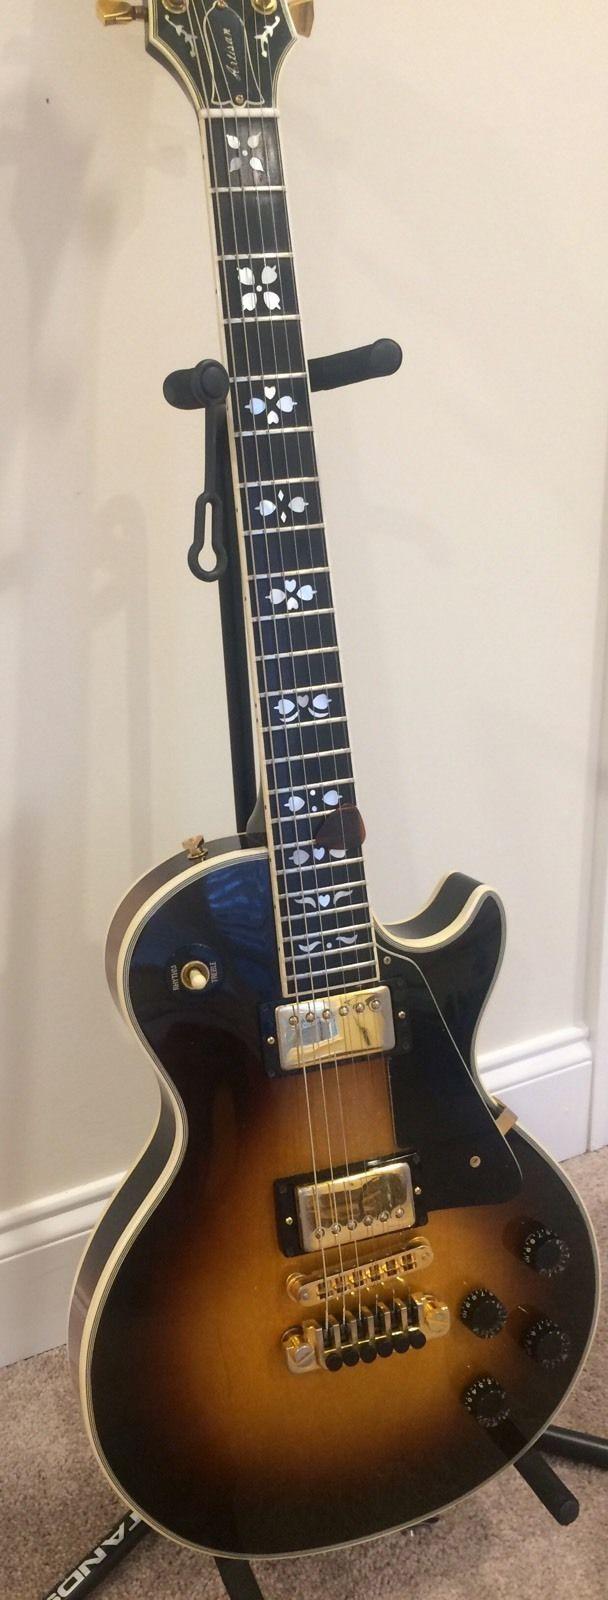 Gibson Les Paul Artisan Vintage